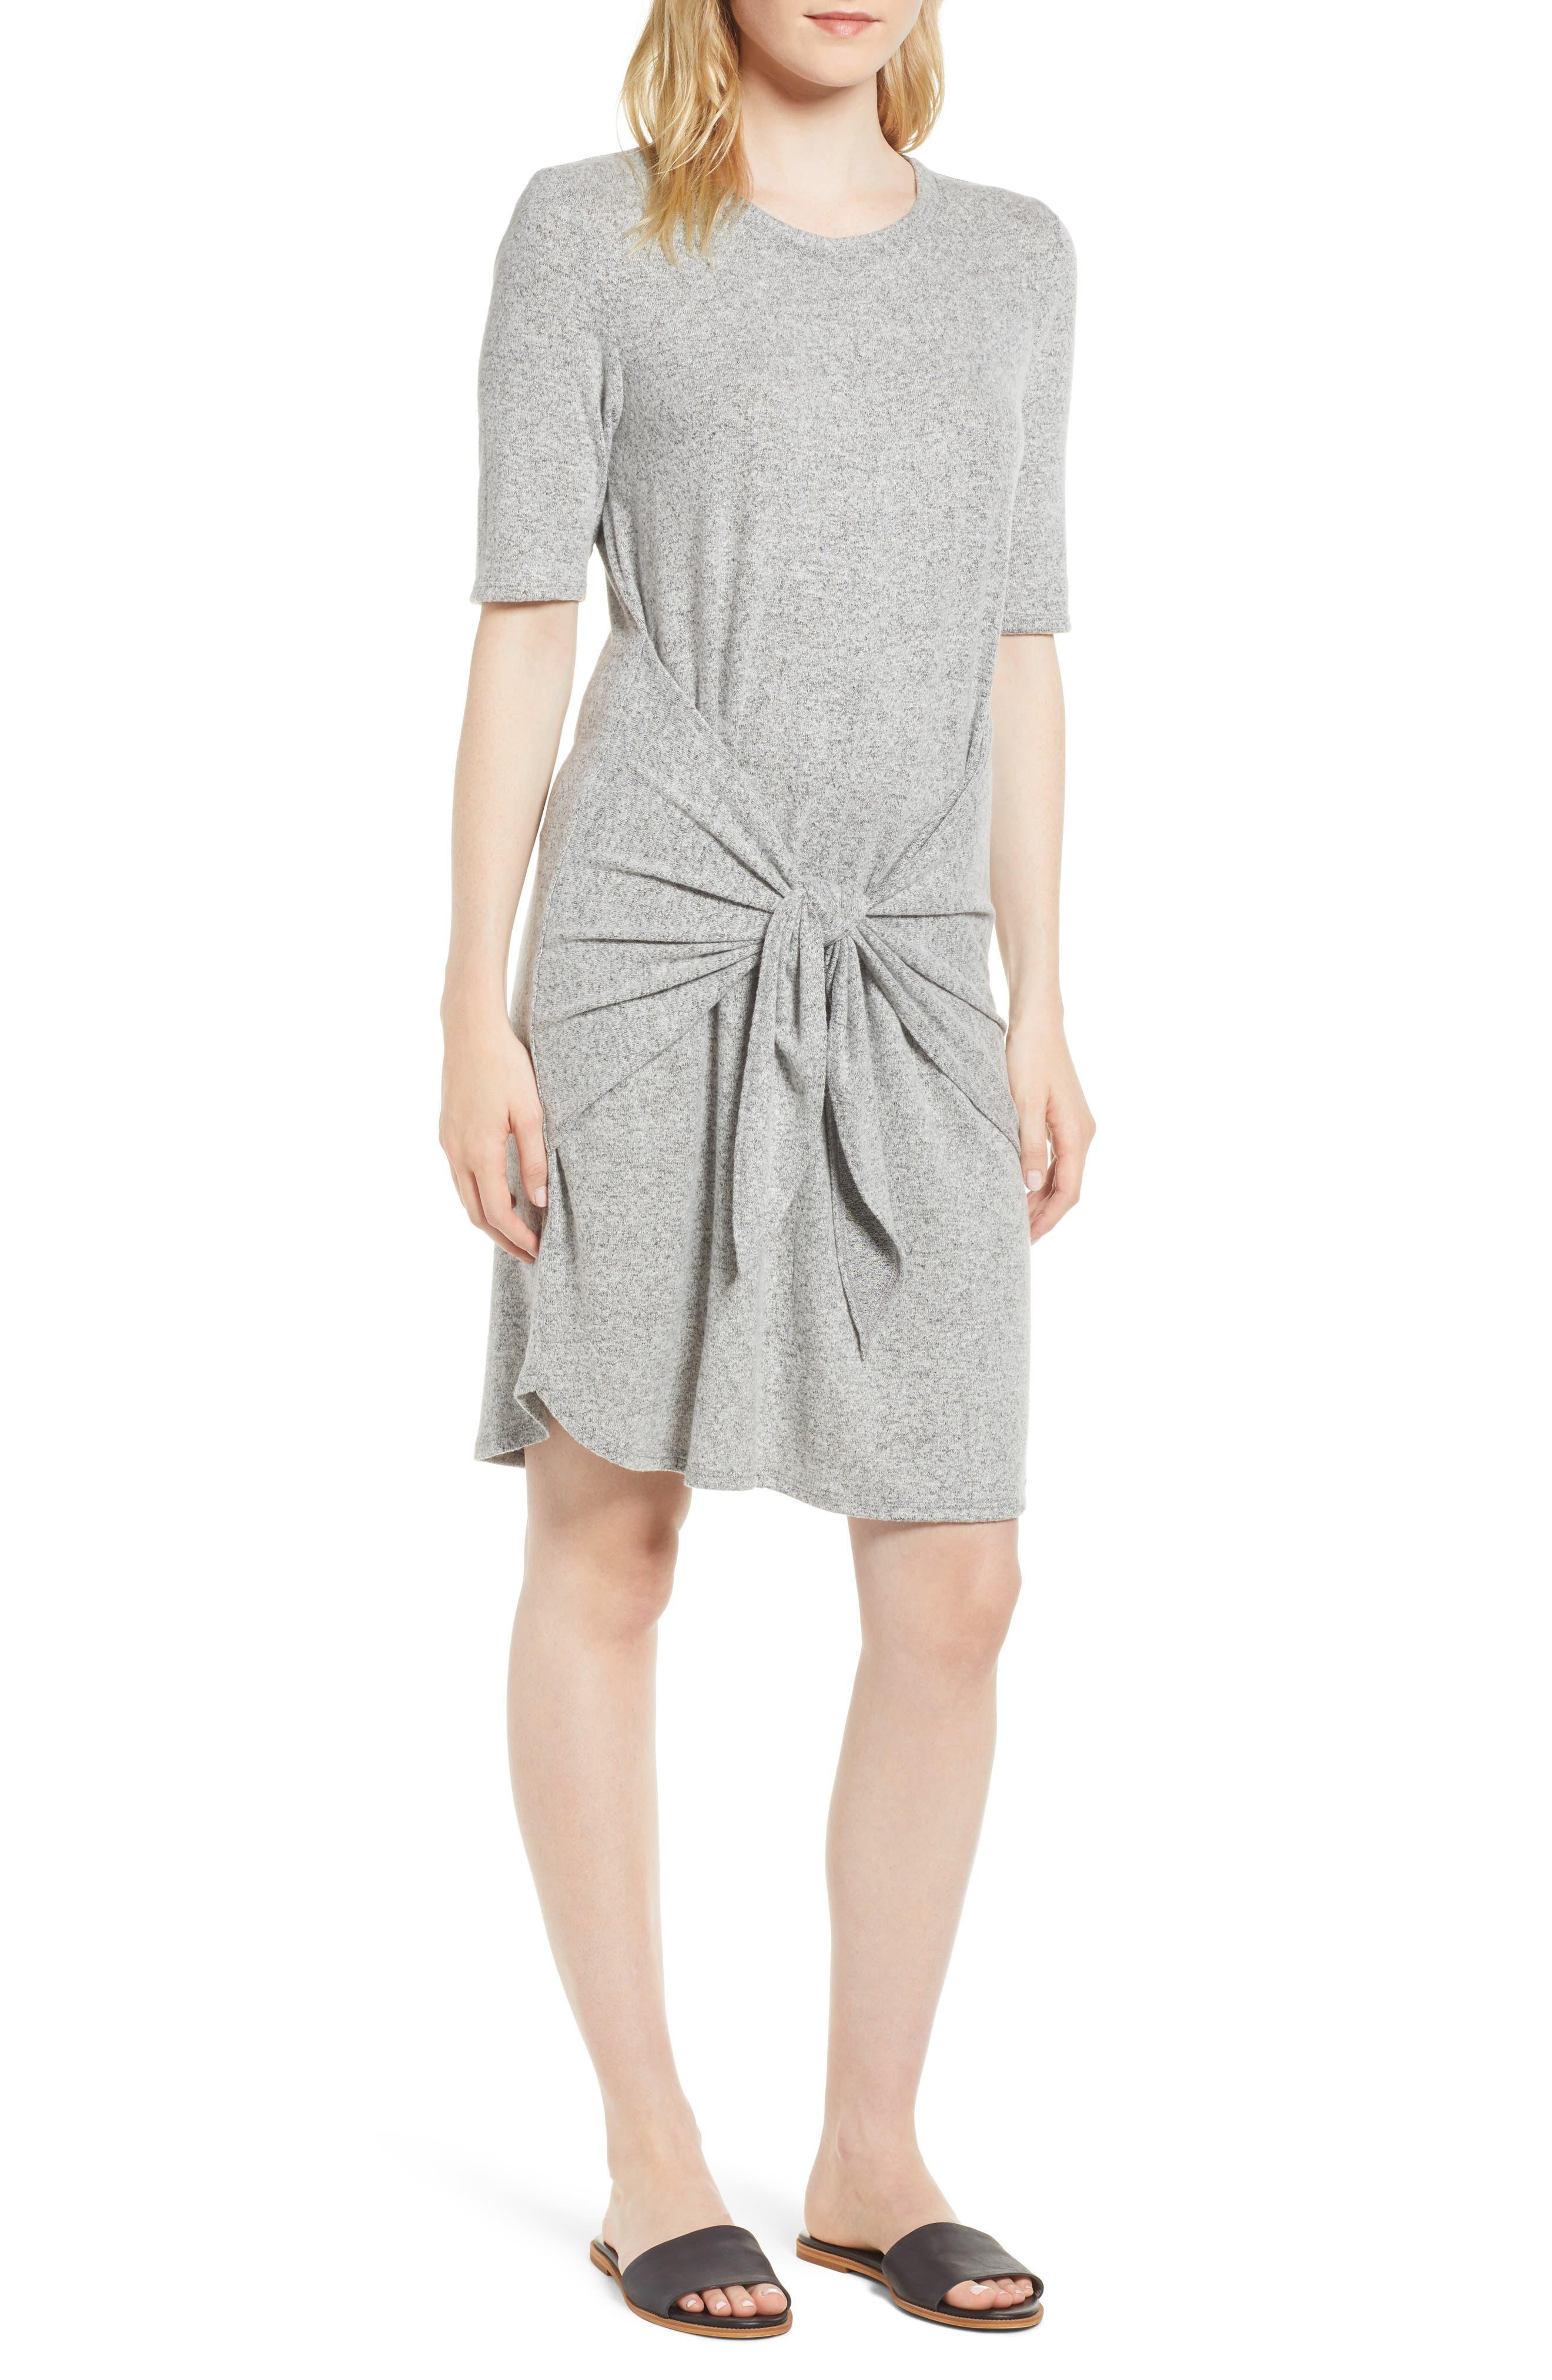 Caslon Off-Duty Tie Front Knit Dress,                             Main thumbnail 1, color,                             Grey Heather